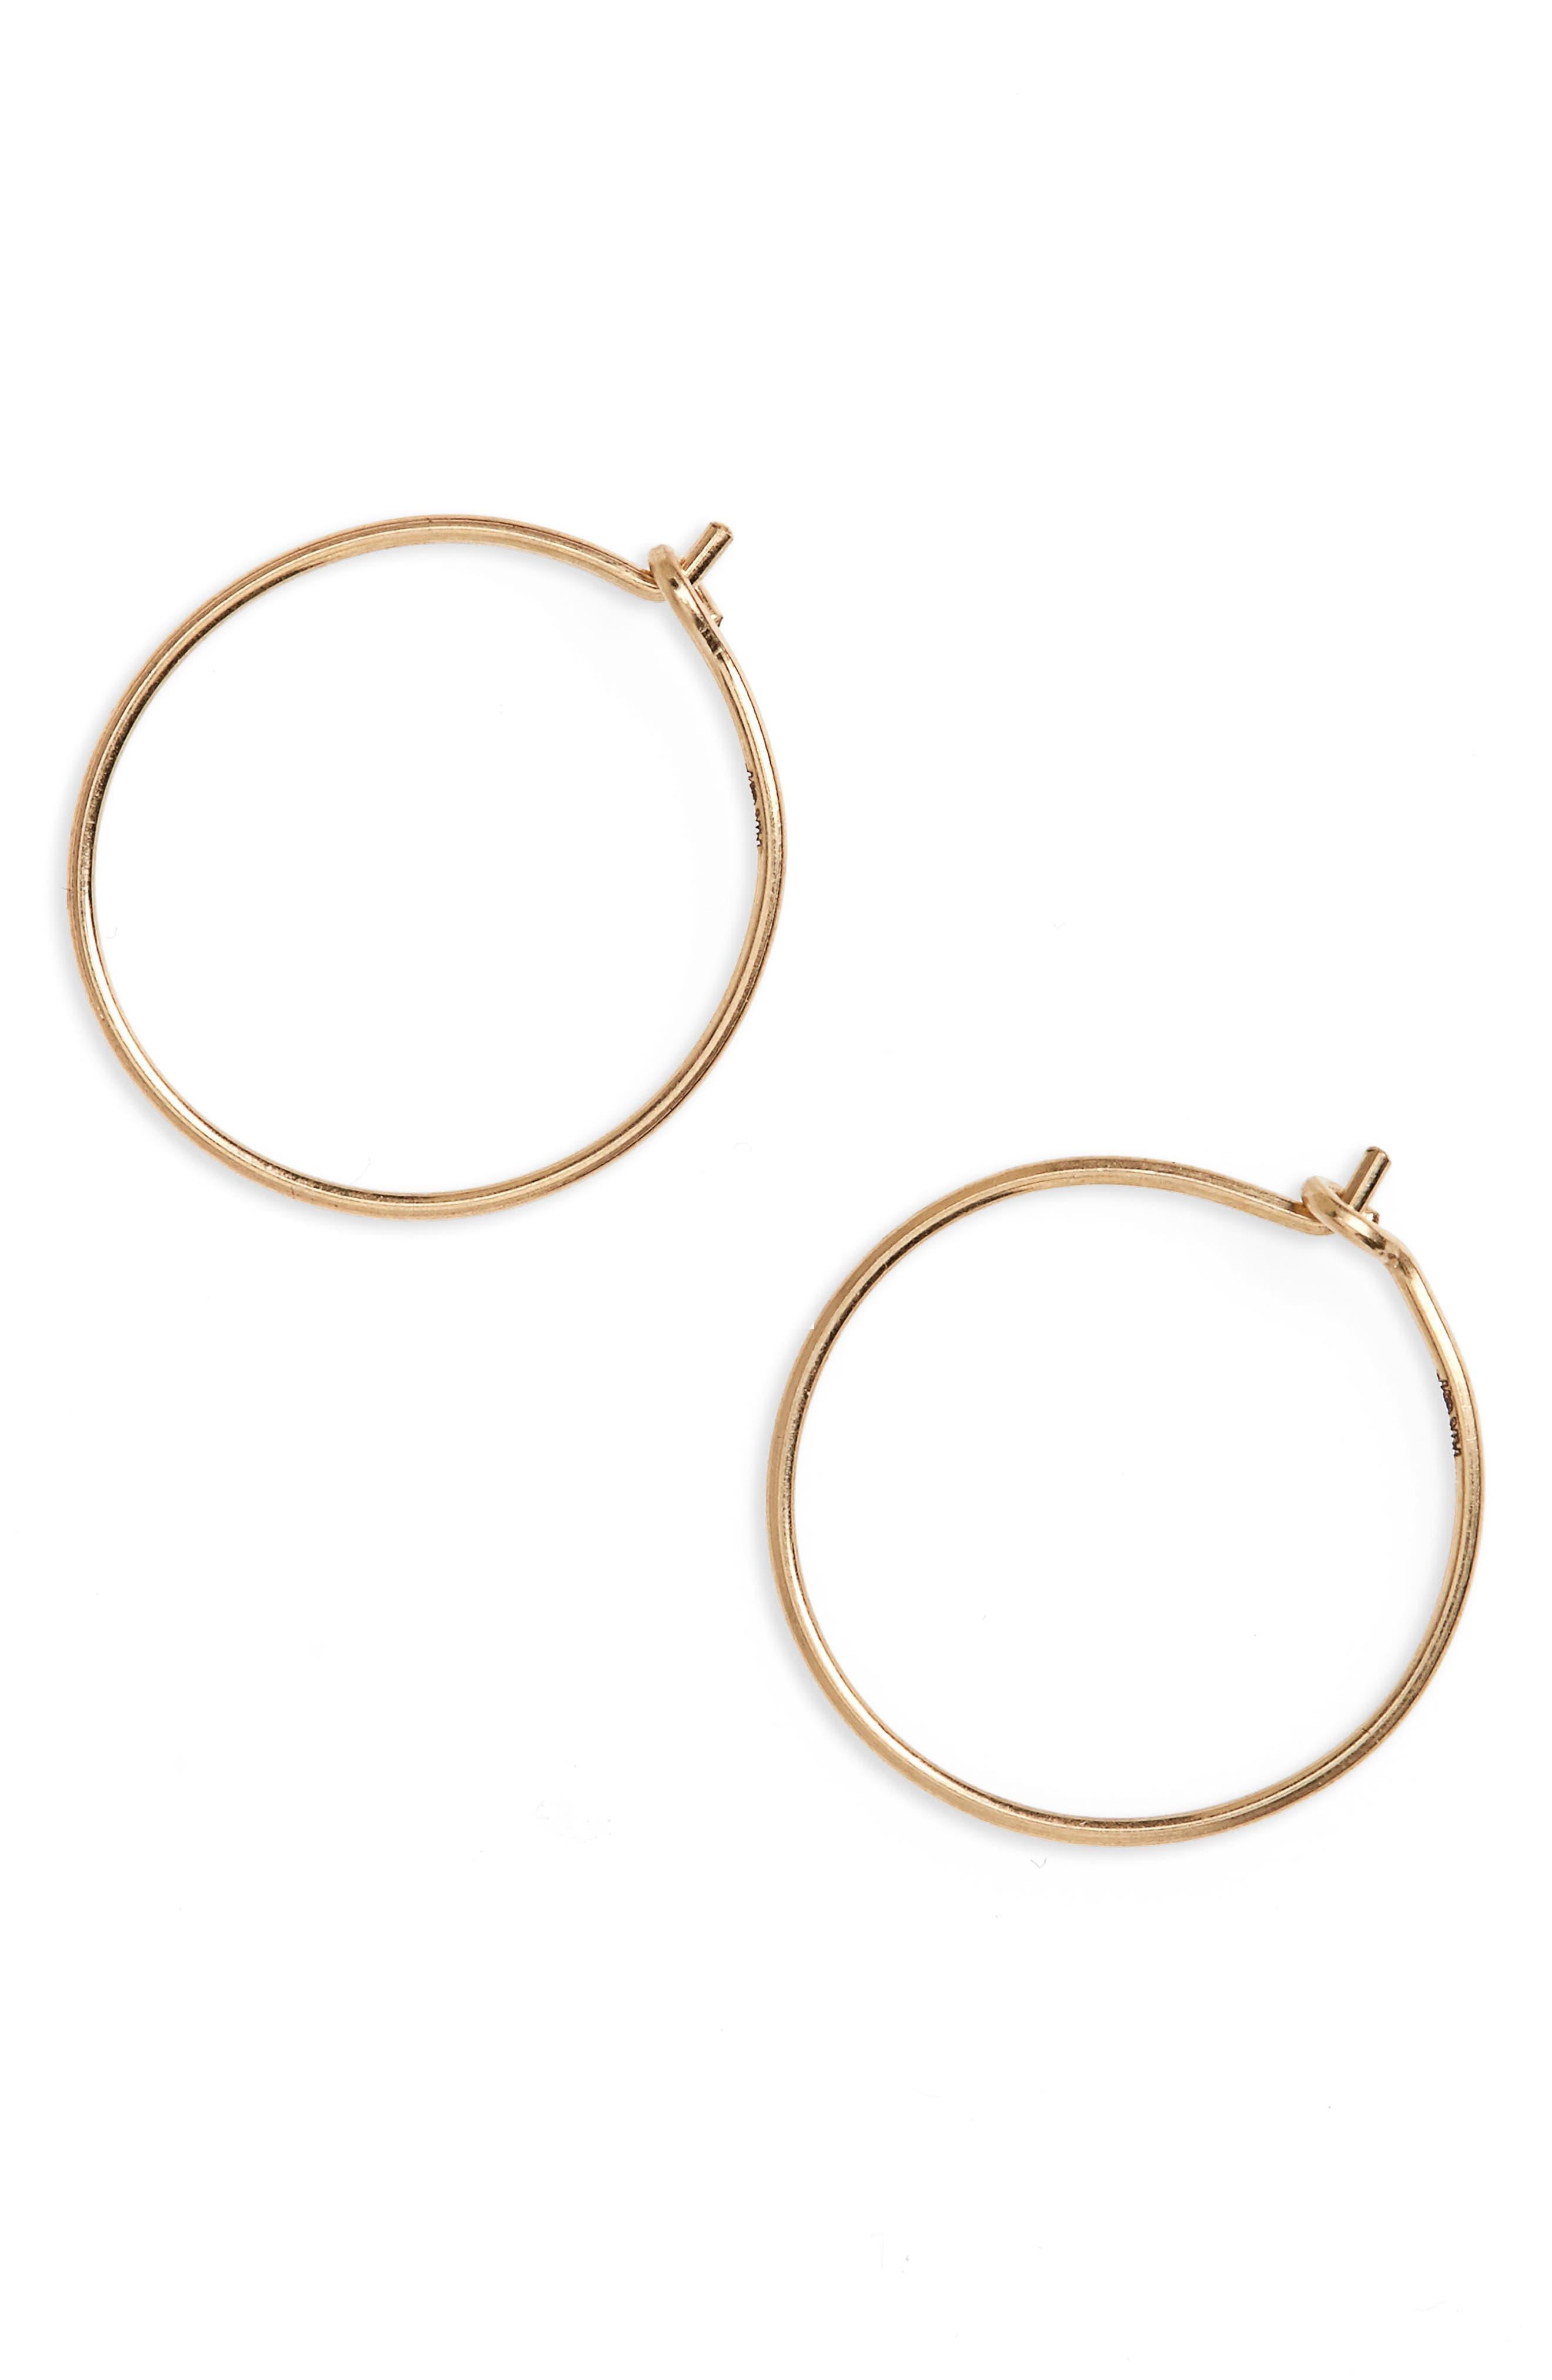 Delicate Wire Hoop Earrings,                         Main,                         color, Gold